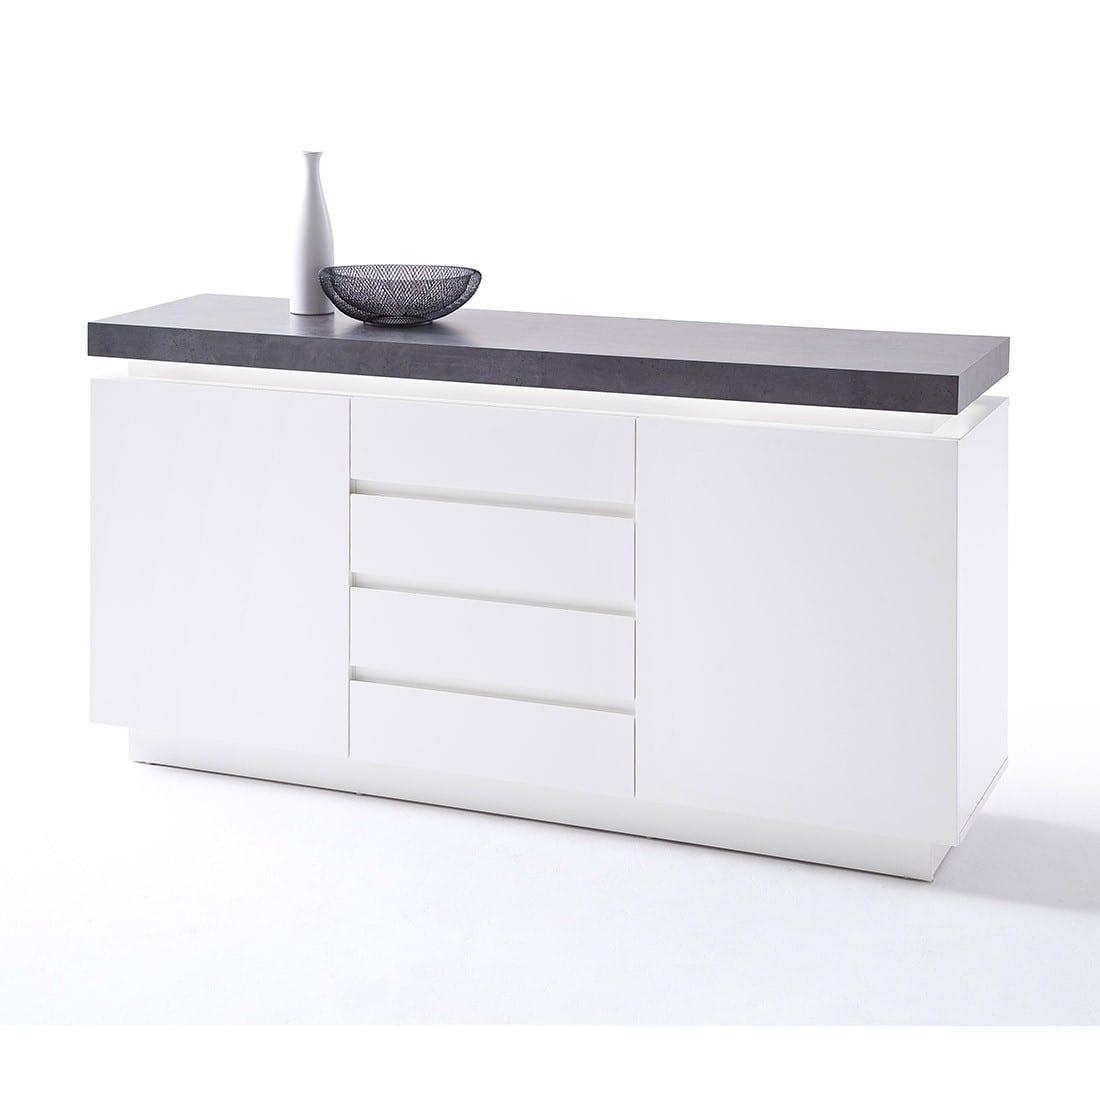 Sideboard Betonoptik 200 Cm